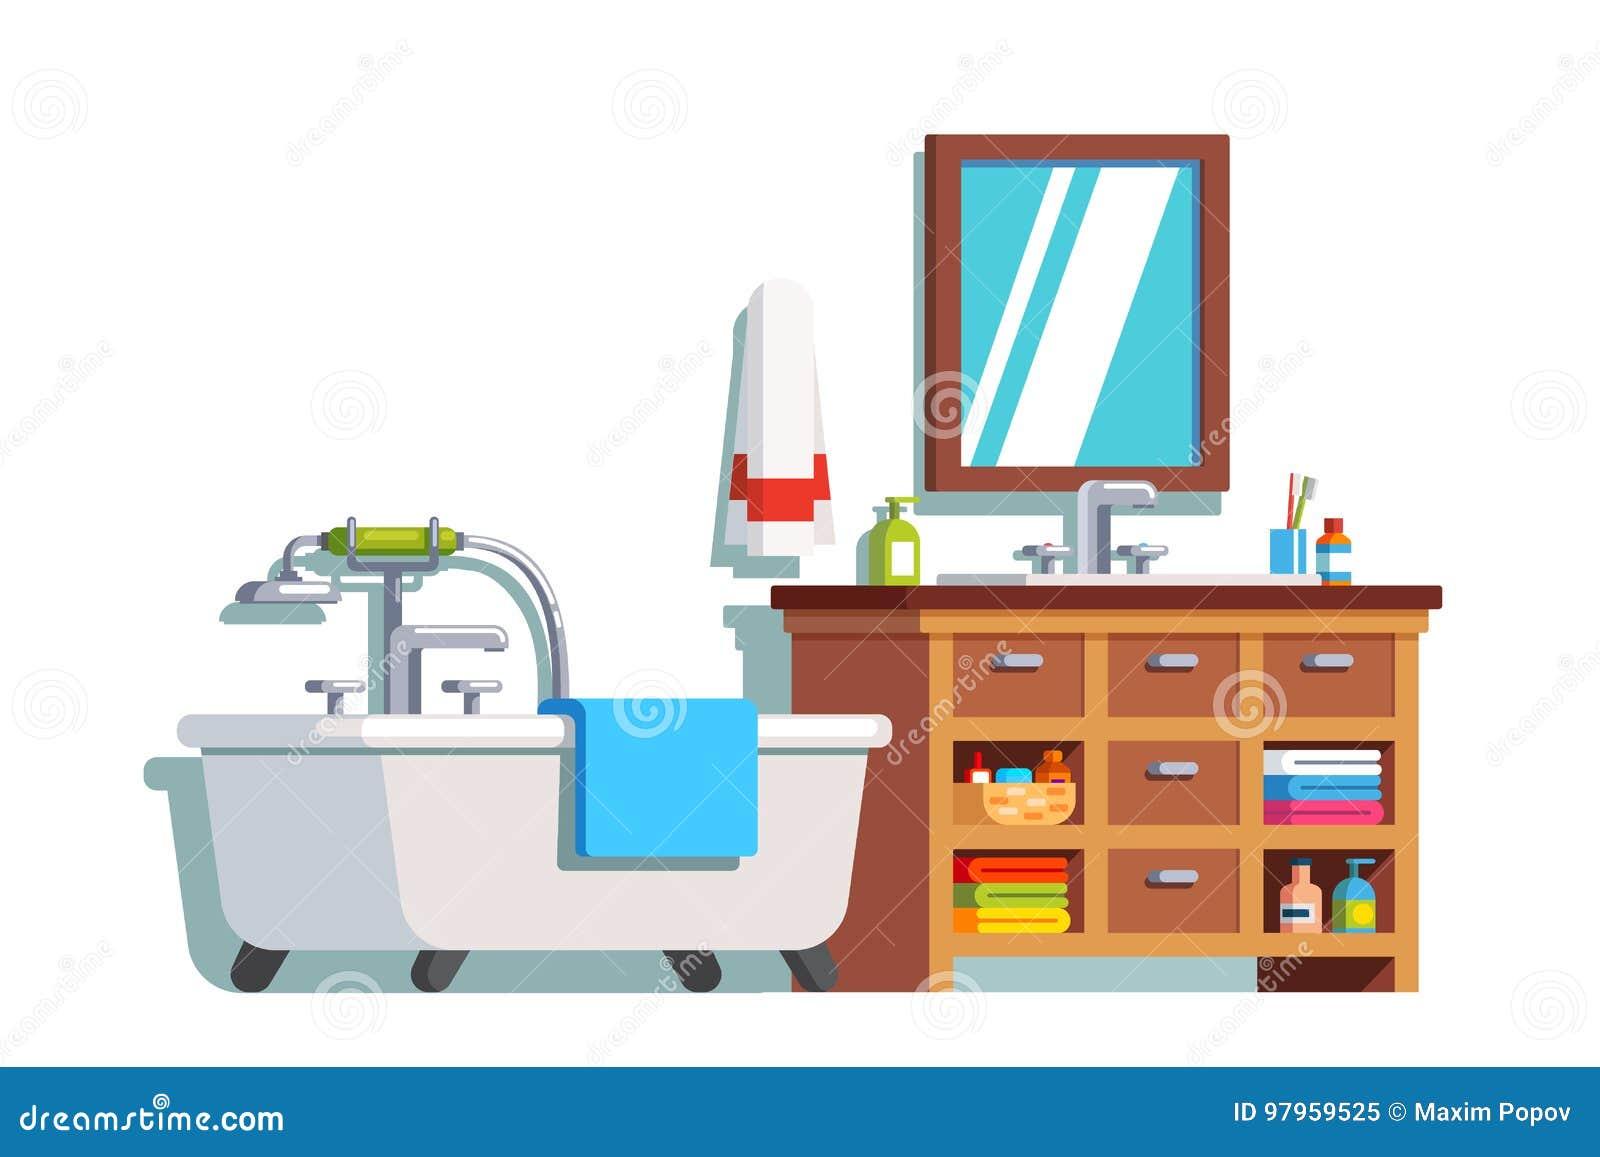 Home Bathroom Interior With Bath Sink Mirror Stock Vector Illustration Of Bath House 97959525